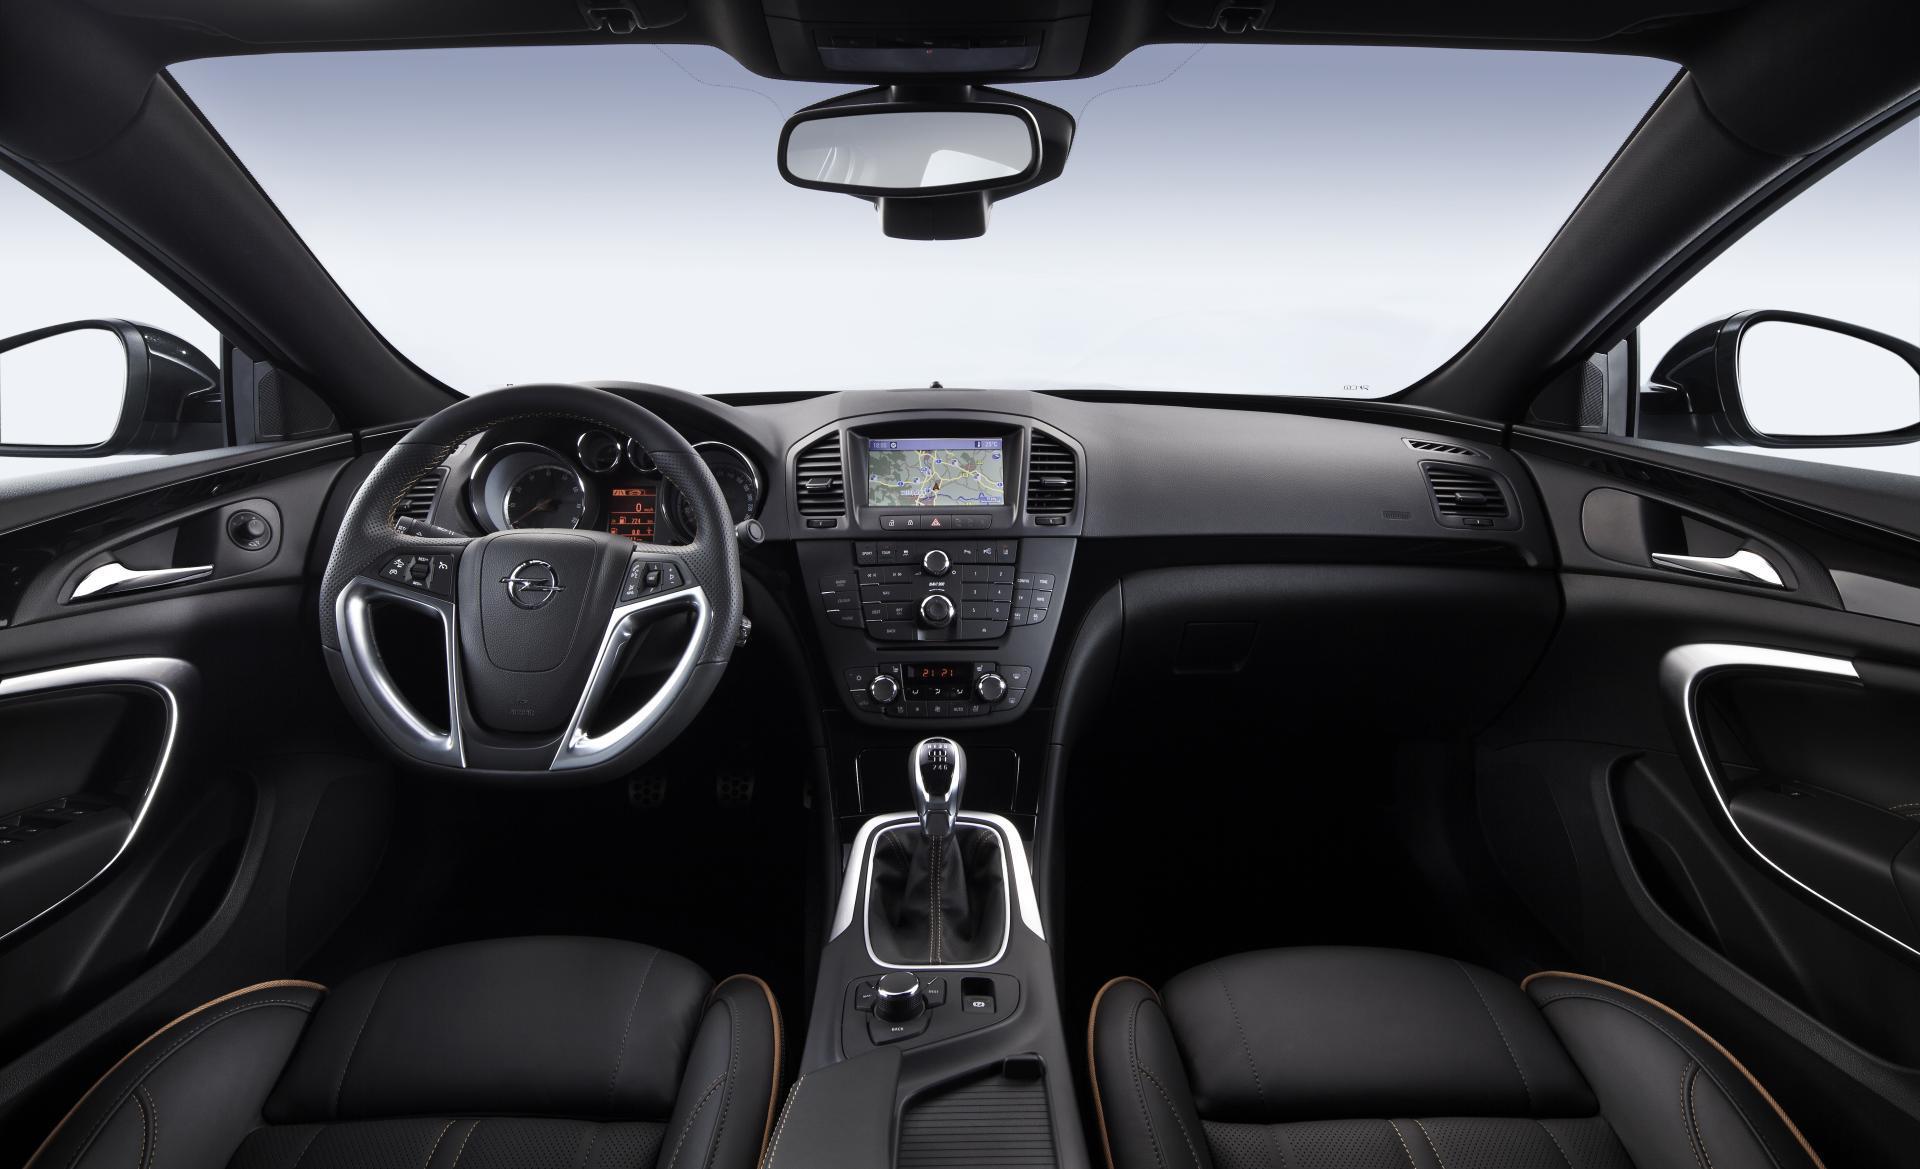 2012 Opel Insignia Picture 73157